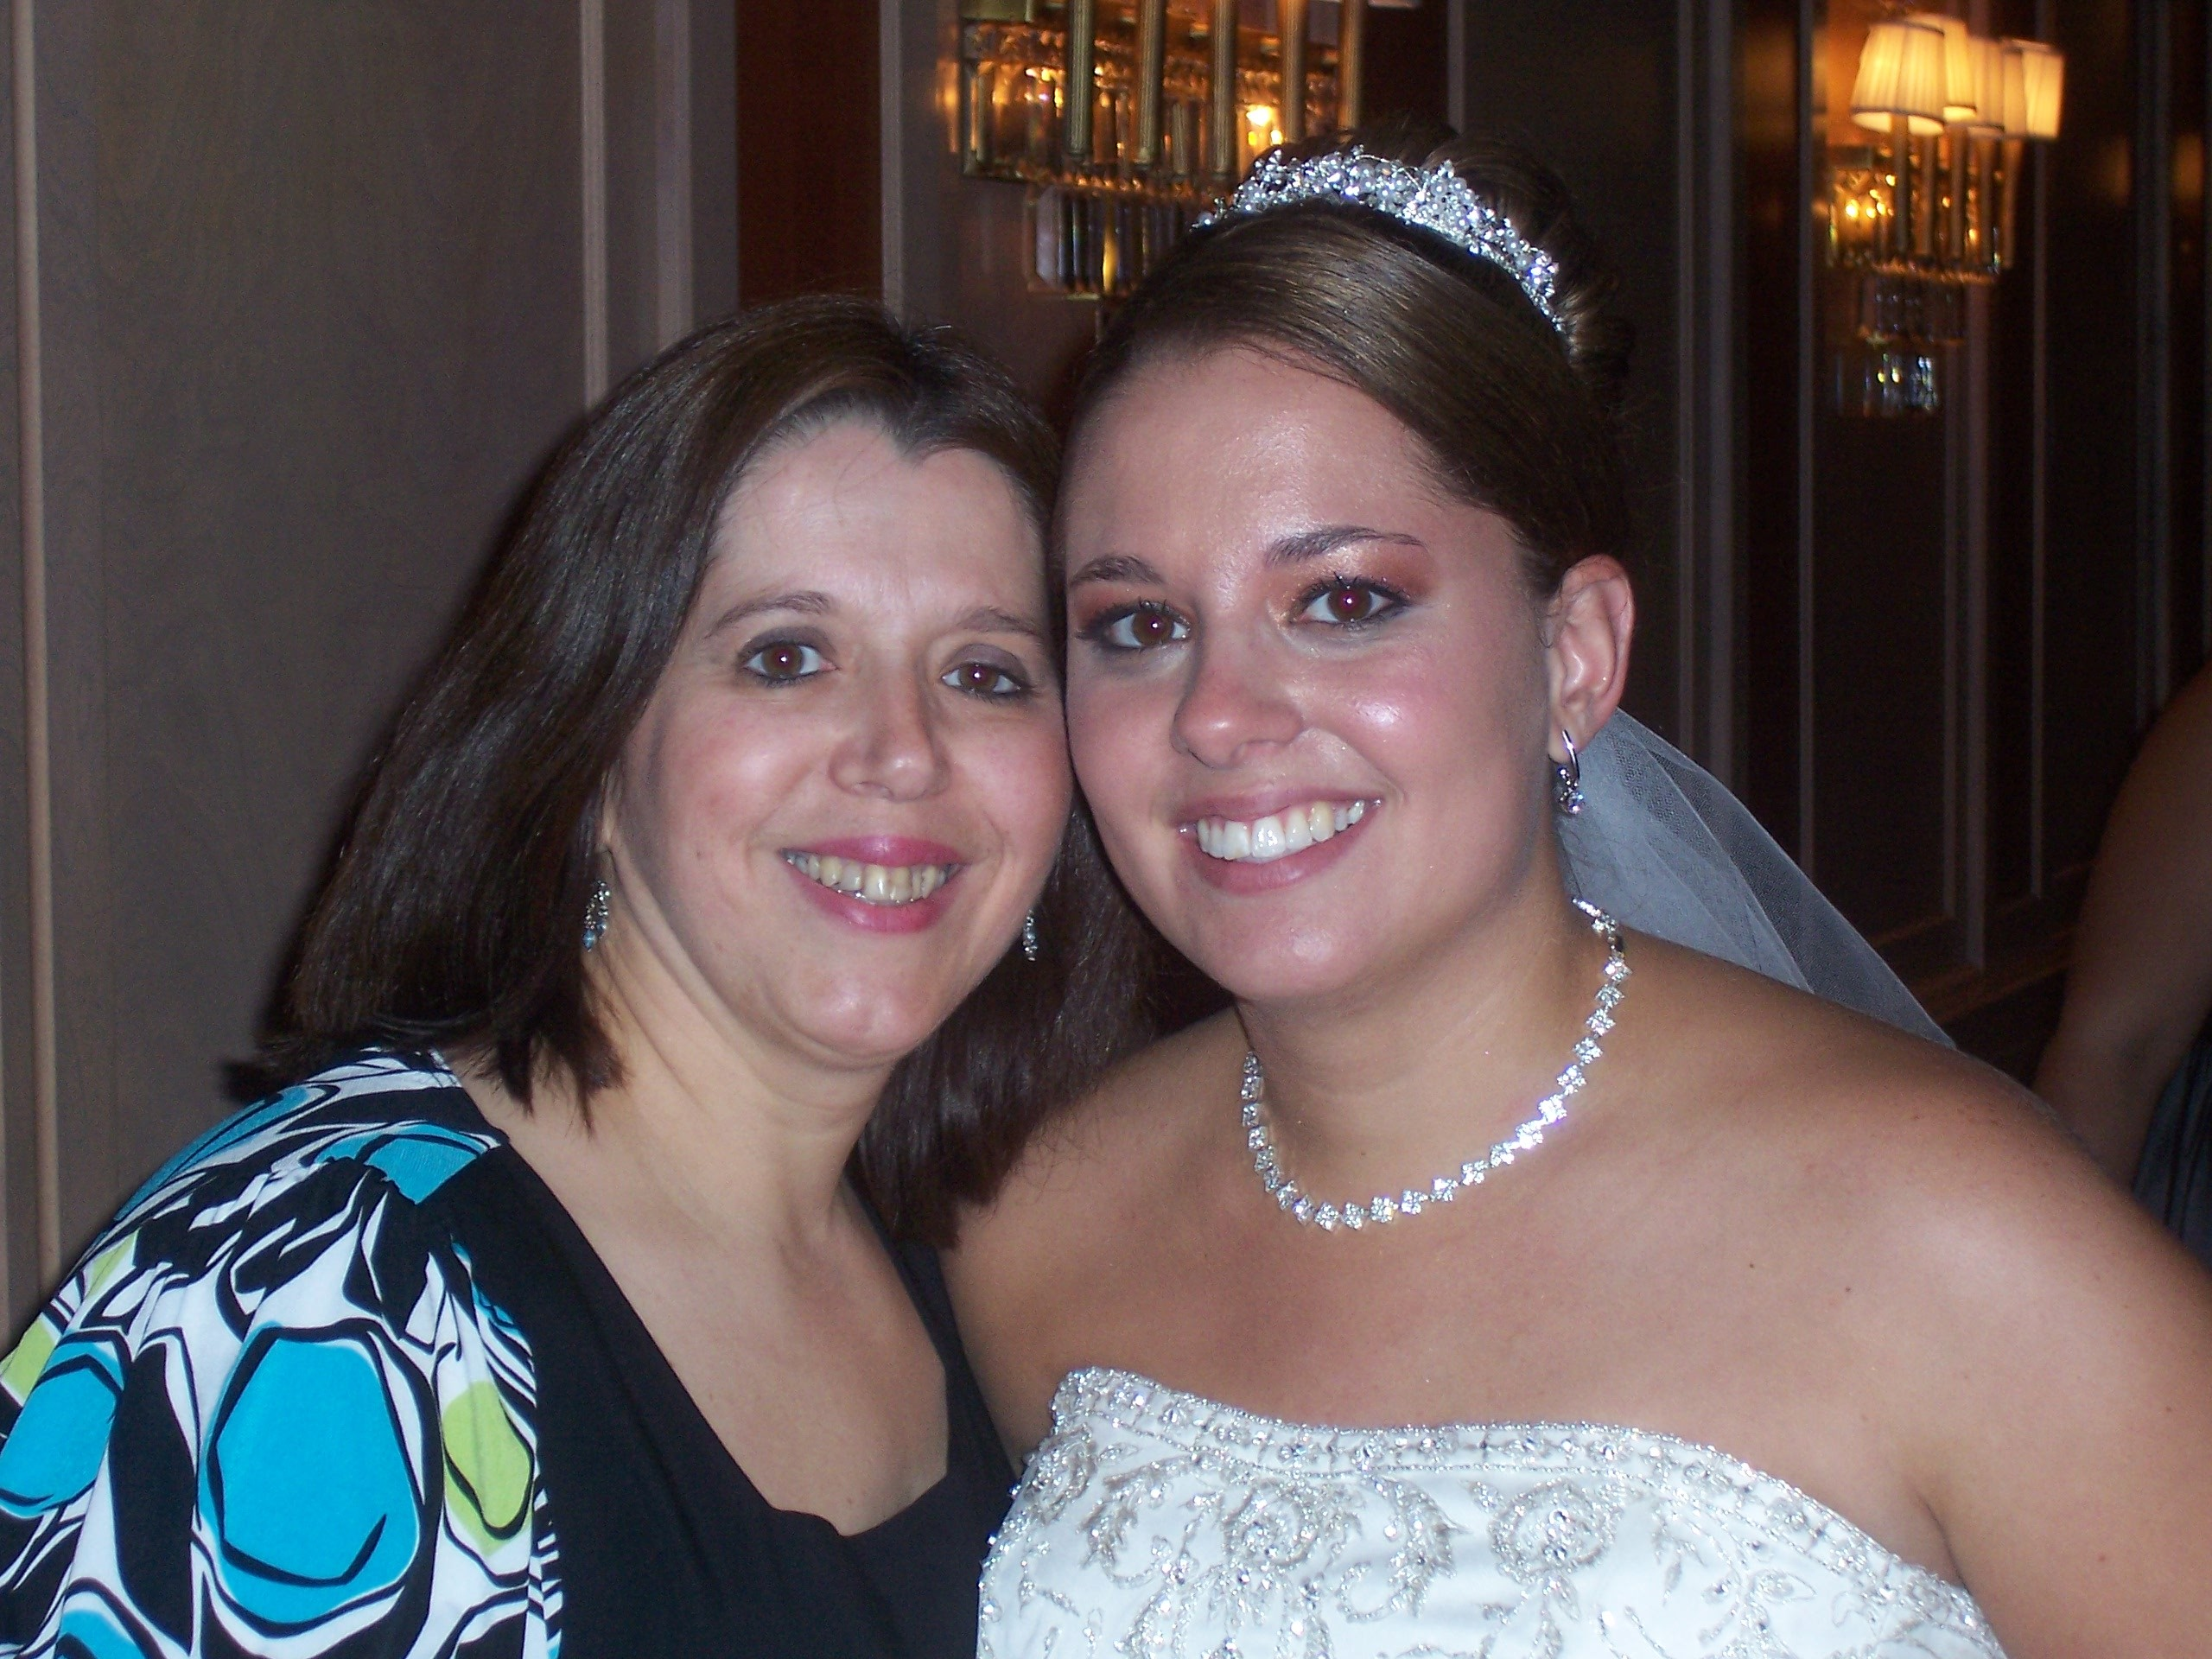 Wedding Dresses, Fashion, dress, Bride, Dj, Ra-mu and the crew